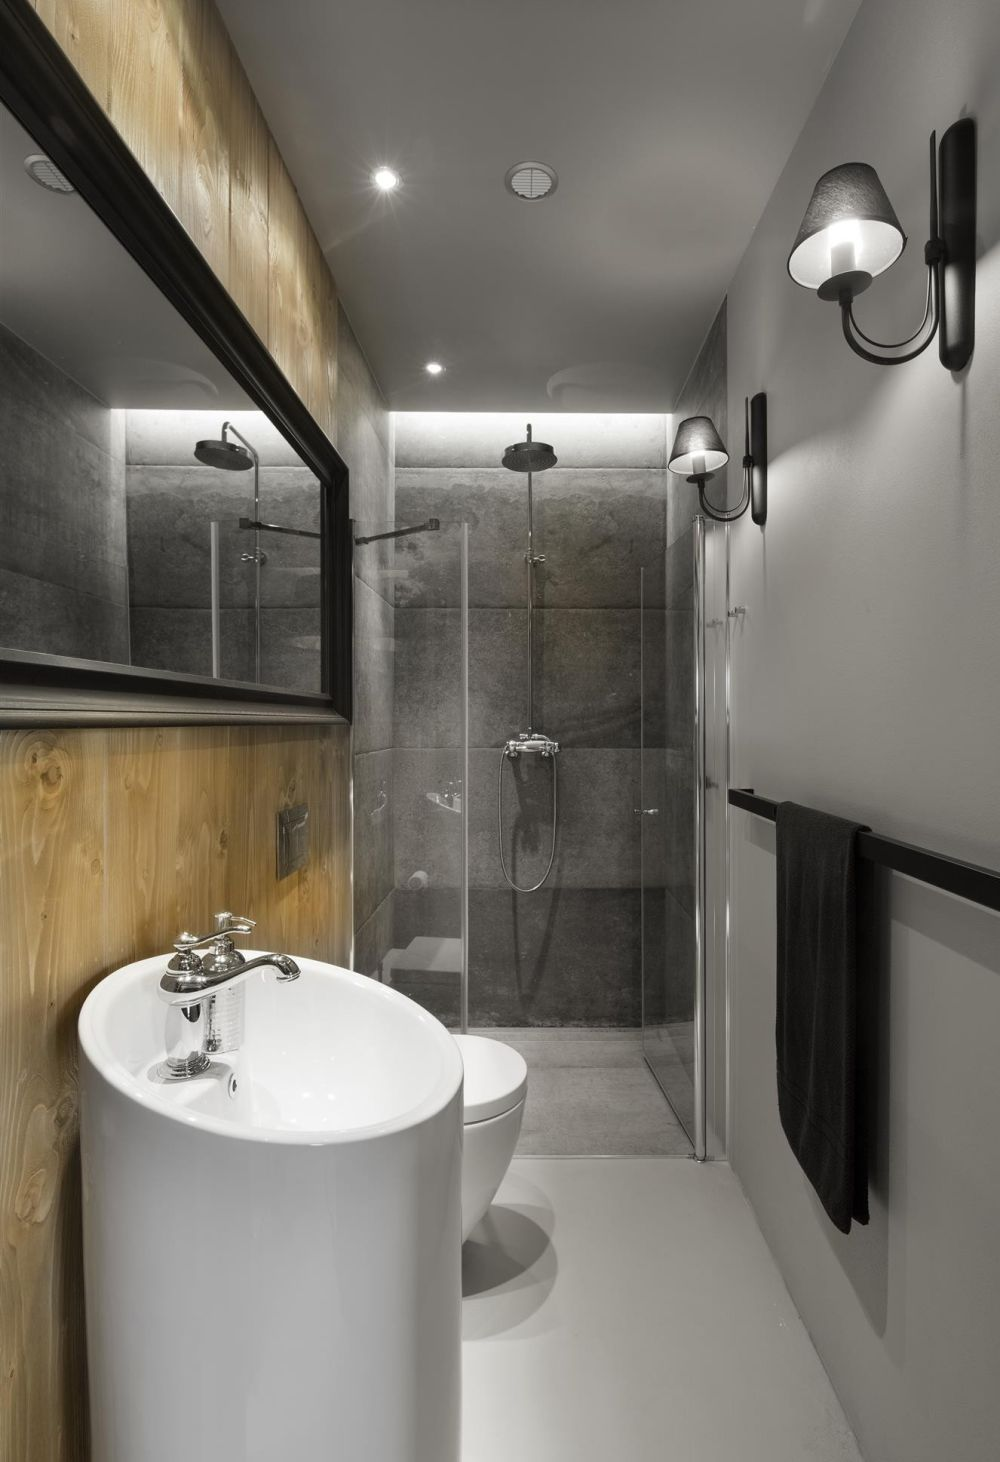 adelaparvu.com despre casa contemporana inspirata de arhitectura traditionala, Design Hola Design Studio, arhitectura Exterior, Foto Yassen Hristov (7)